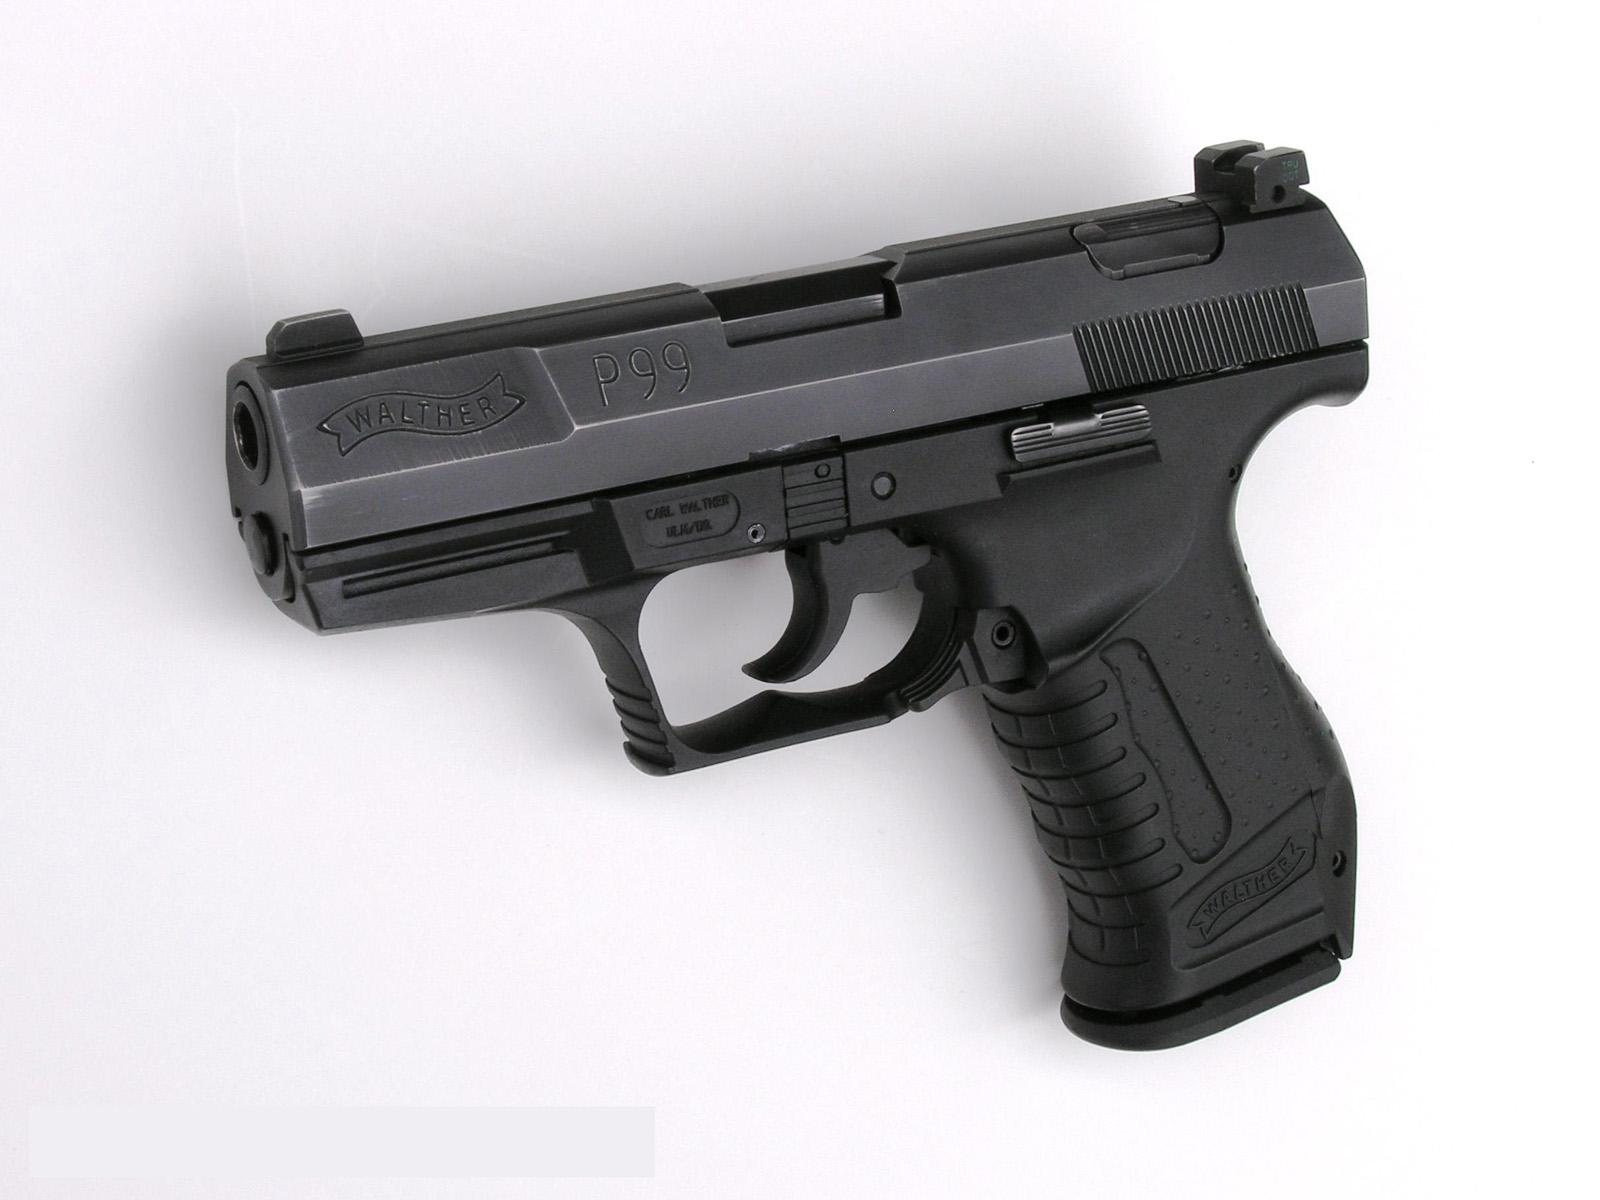 http://2.bp.blogspot.com/-8p62s3YT2I8/Tn1g2RVWONI/AAAAAAAABUQ/eYyzd53twIA/s1600/Walther_PPK_99_9mm_Gun_HD_Weapon_Desktop_Background_Paos_Vvallpaper.net.jpg